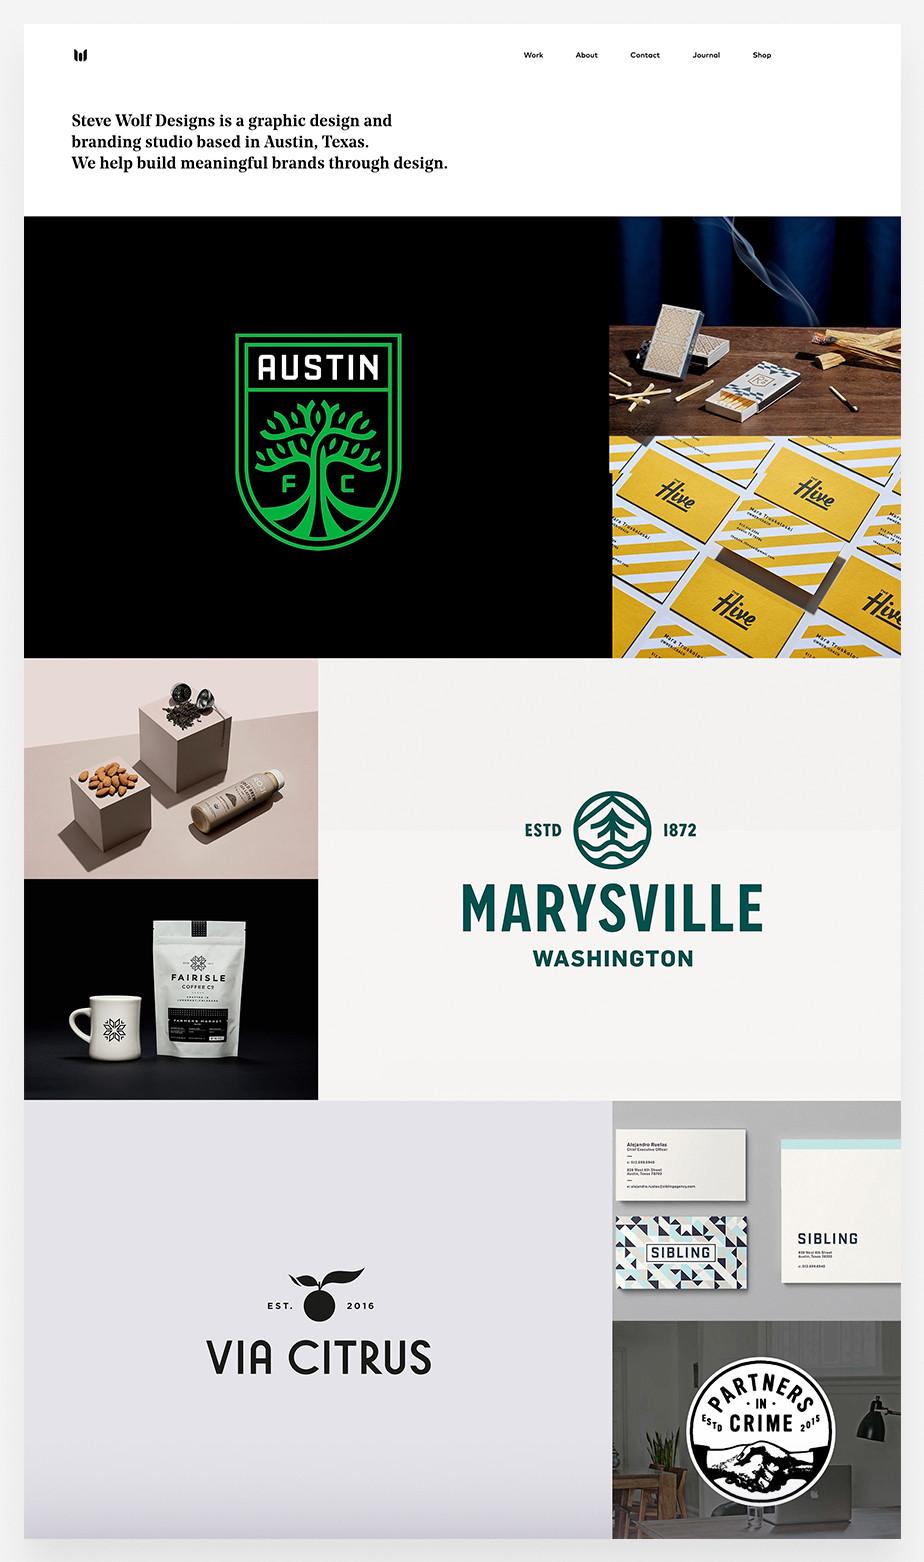 Marketing portfolio examples: Steve Wolf Designs